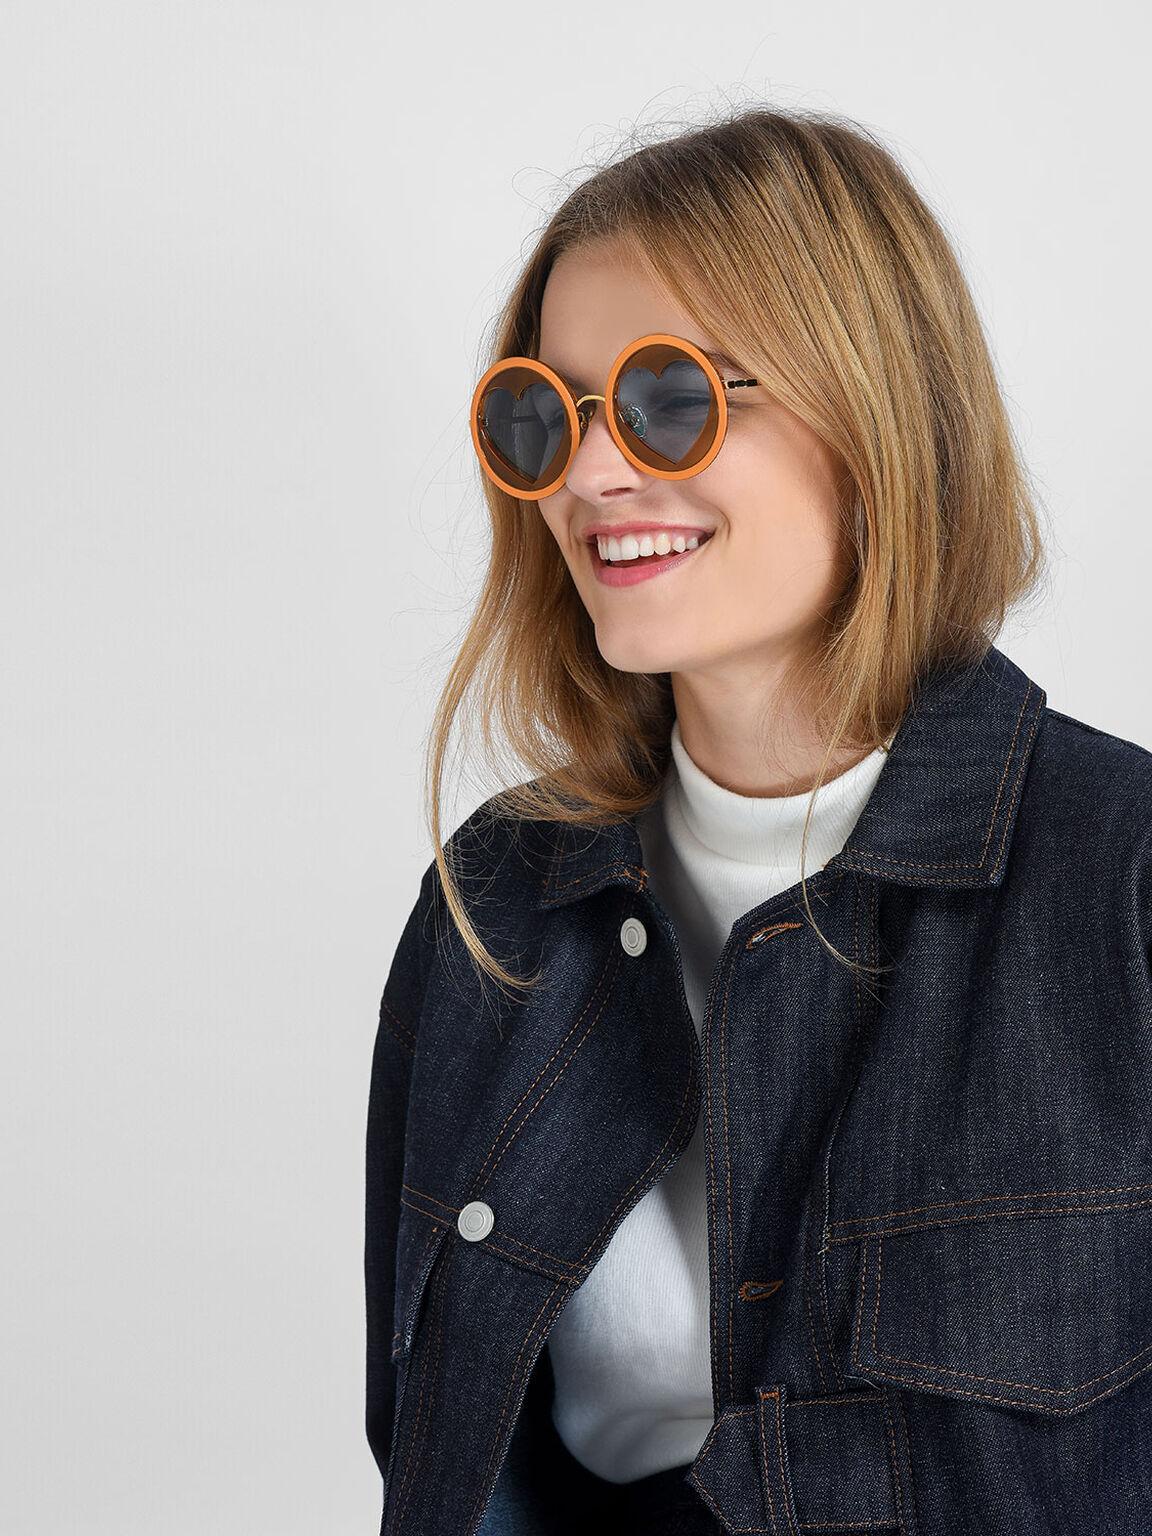 Heart-Shaped Frame Sunglasses, Orange, hi-res